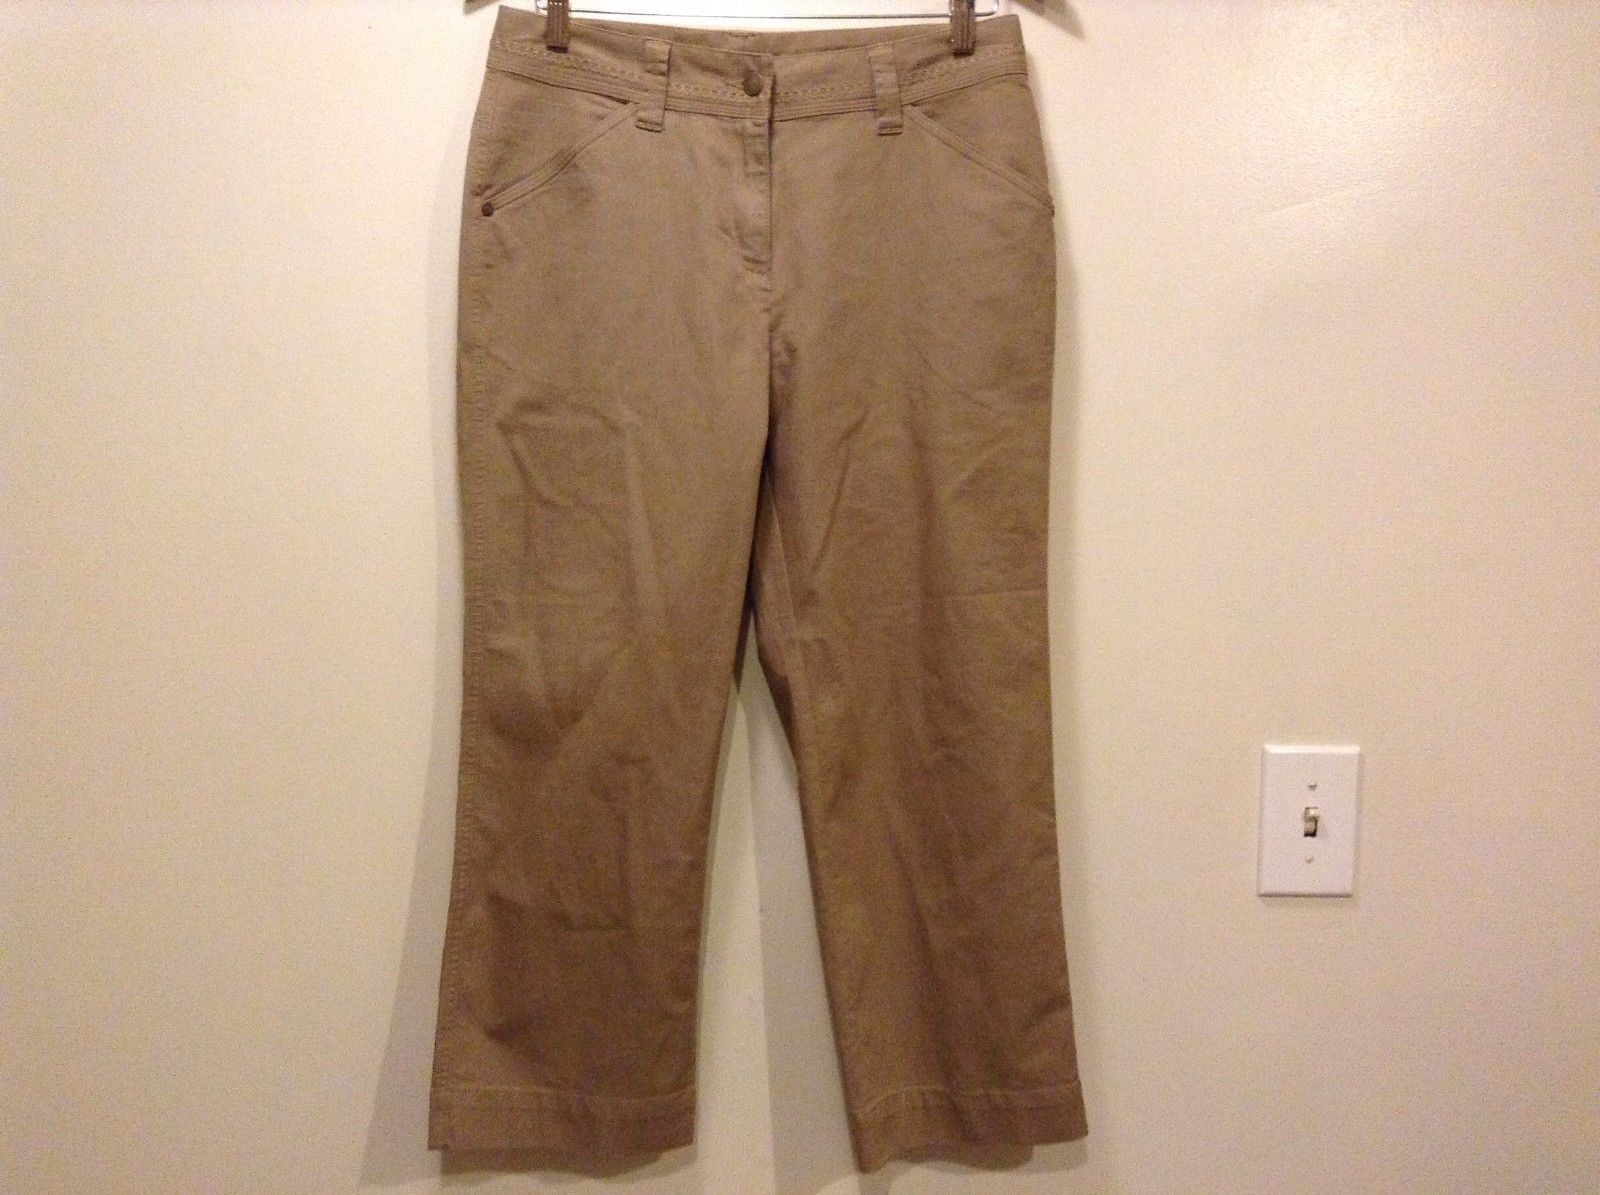 Great Condition Woolrich Size 6 Cotton Blend Dark Khaki 2 Pockets Pants